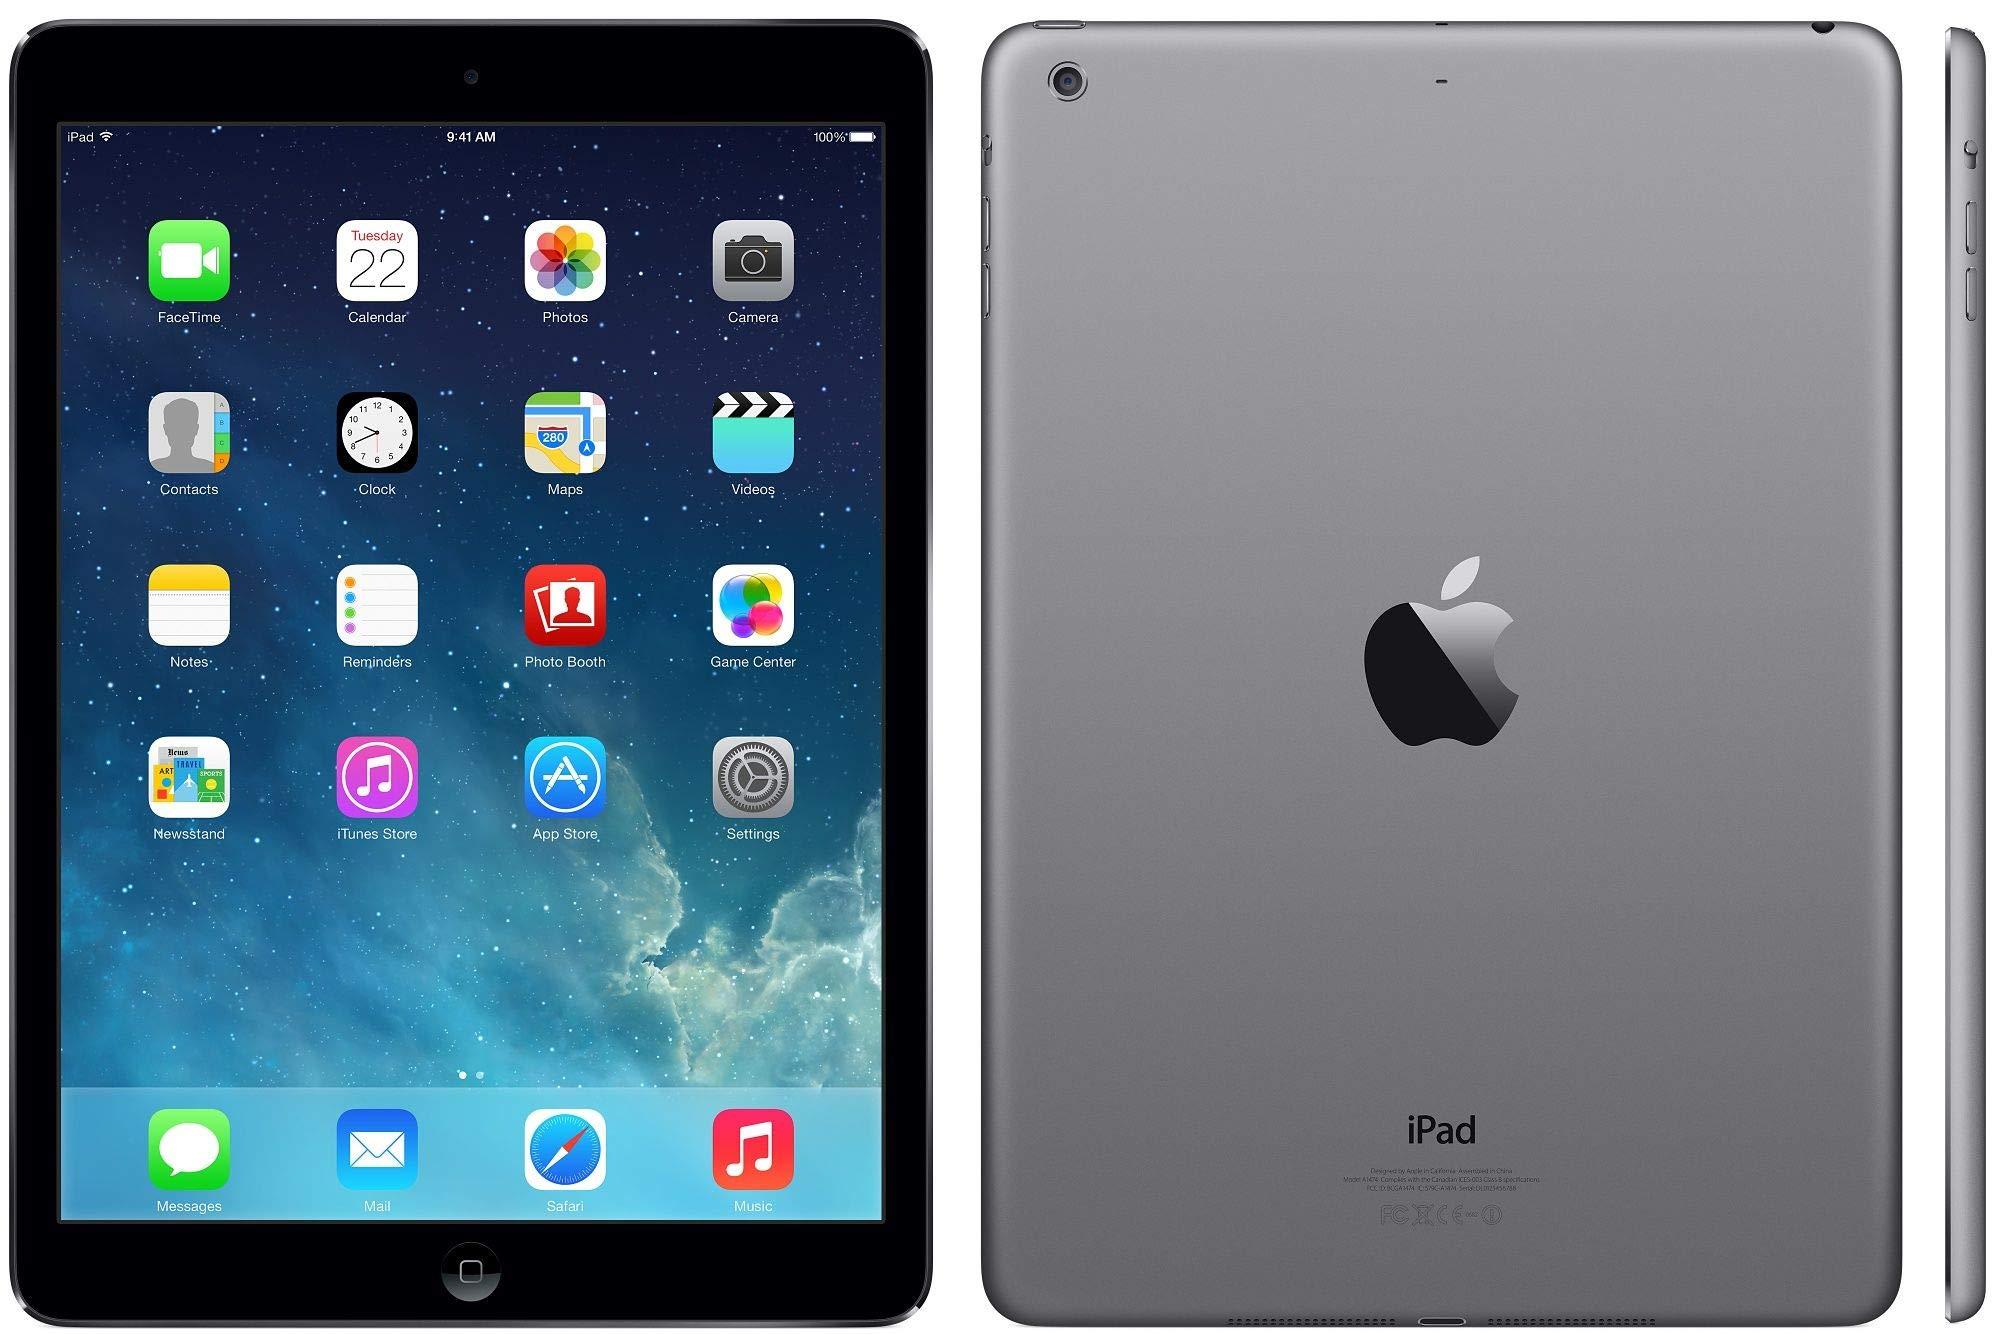 Apple-iPad-Air-16GB-Wi-Fi-Space-Grey-with-Black-Flip-Case-Renewed